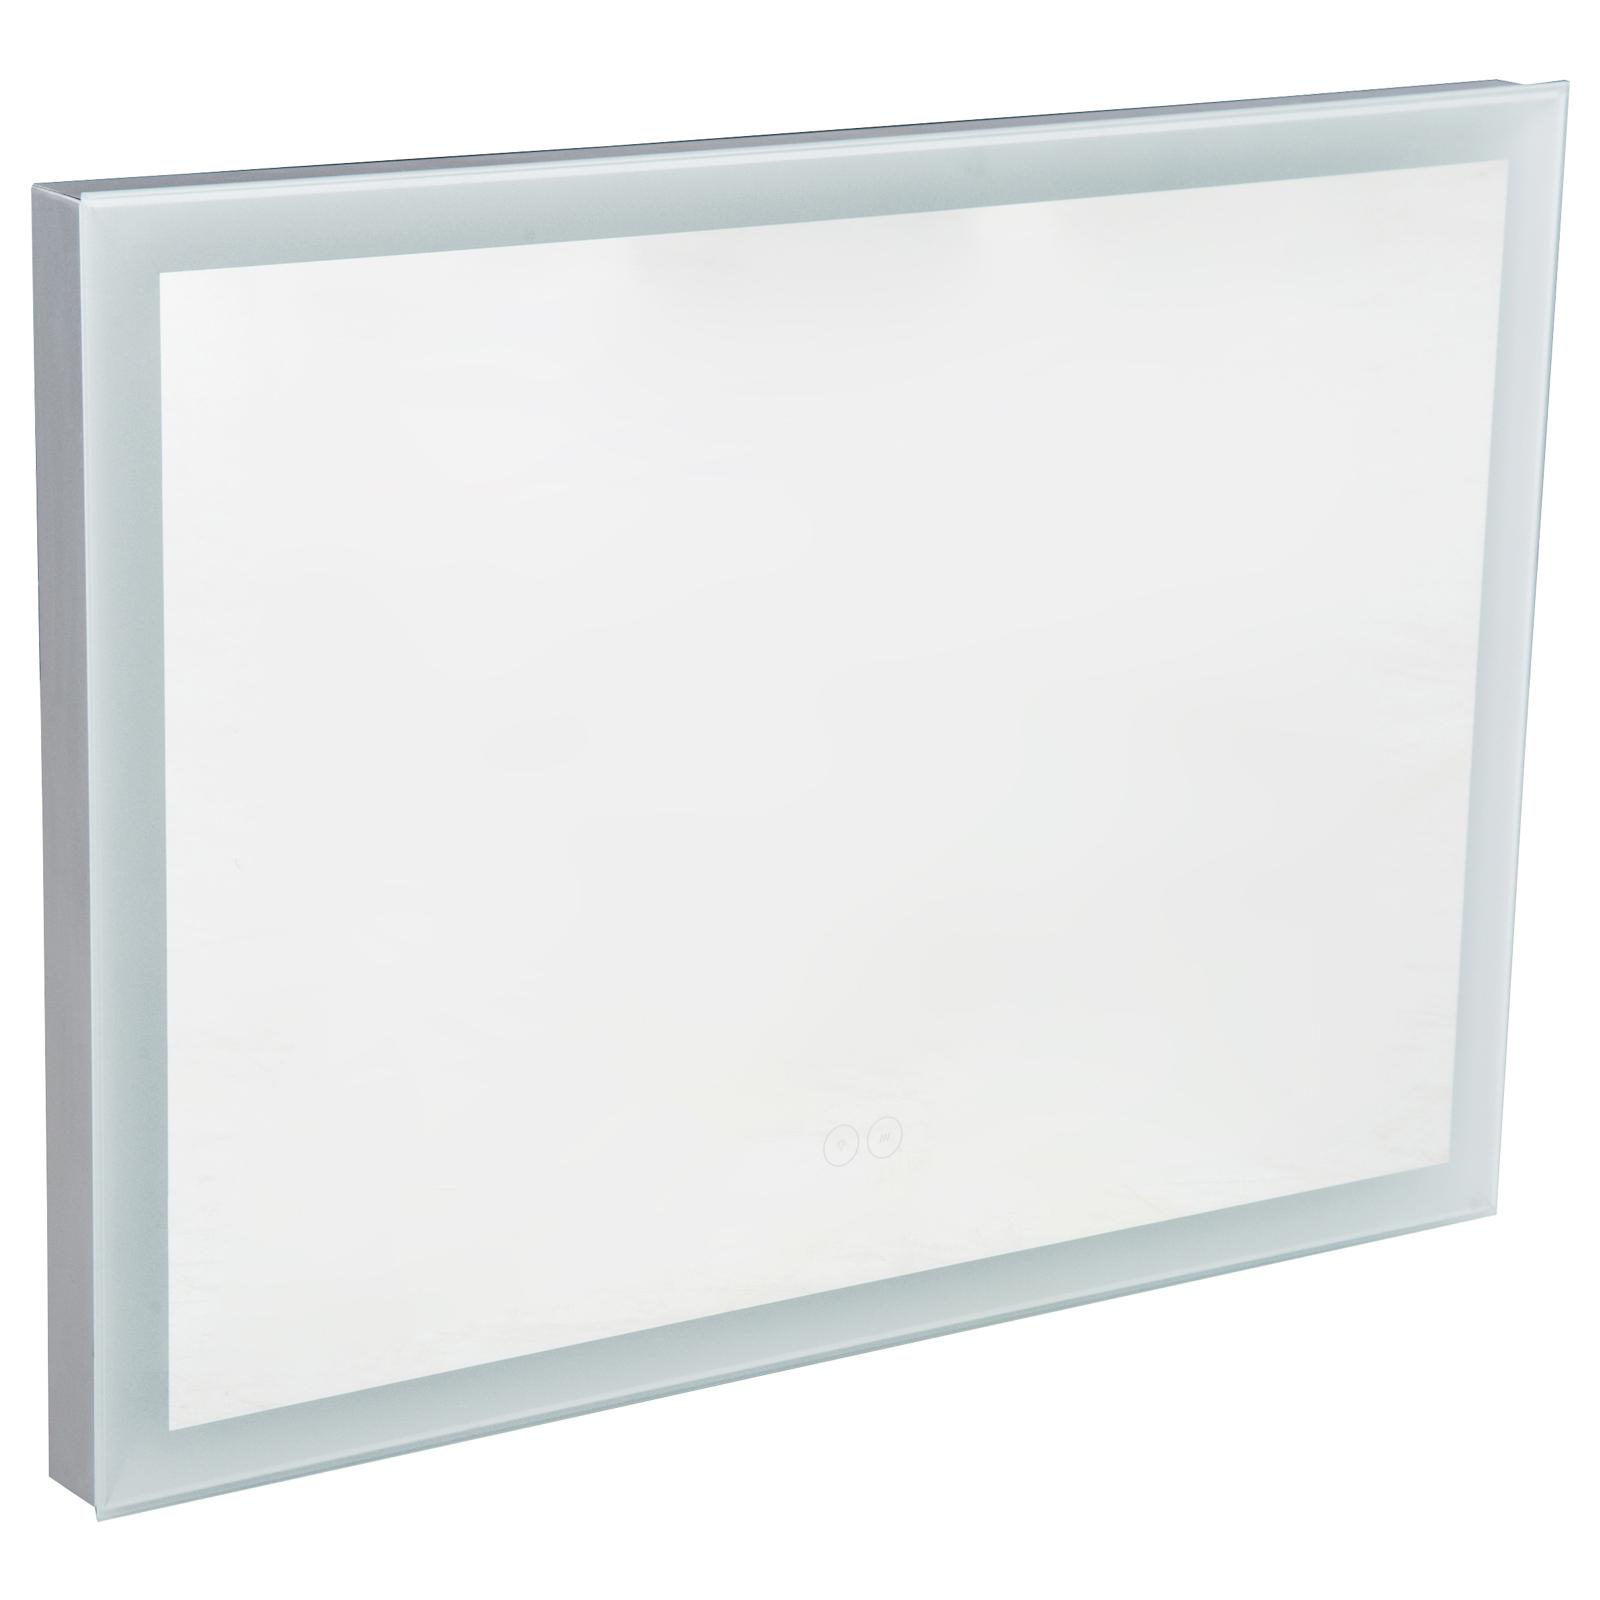 Rectangular LED Illuminated Anti-Fog Bathroom Wall Mirror Lighted ...